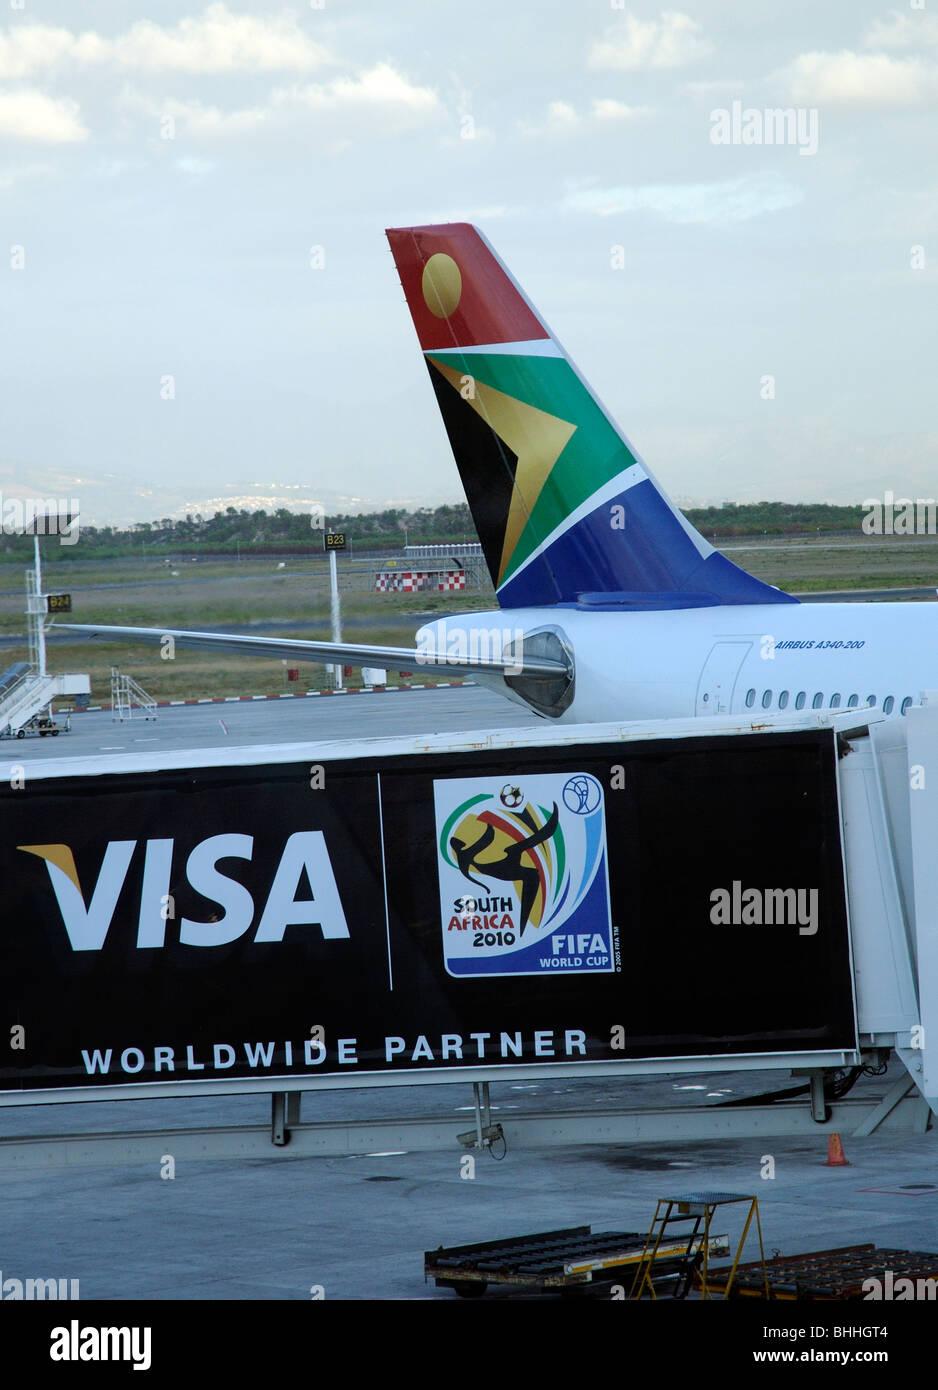 FIFA World Cup sponsor Anzeige bei Cape Town Airport South Africa A South African Airways Airbus im Hintergrund Stockbild